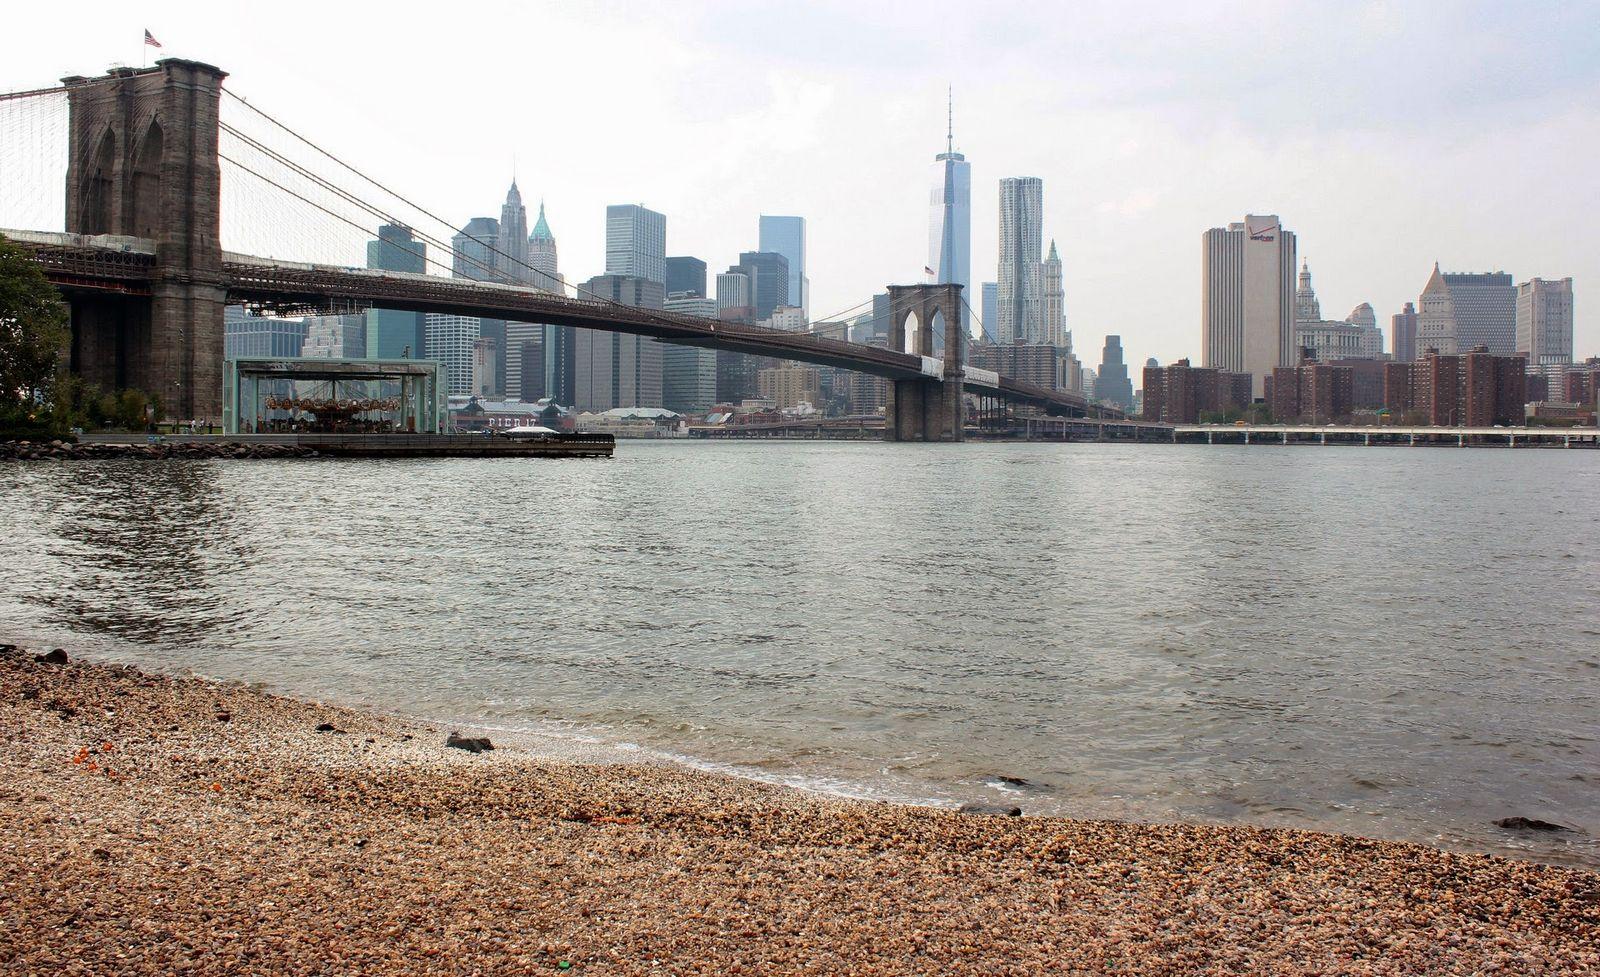 De vuelta en Brooklyn Bridge Park